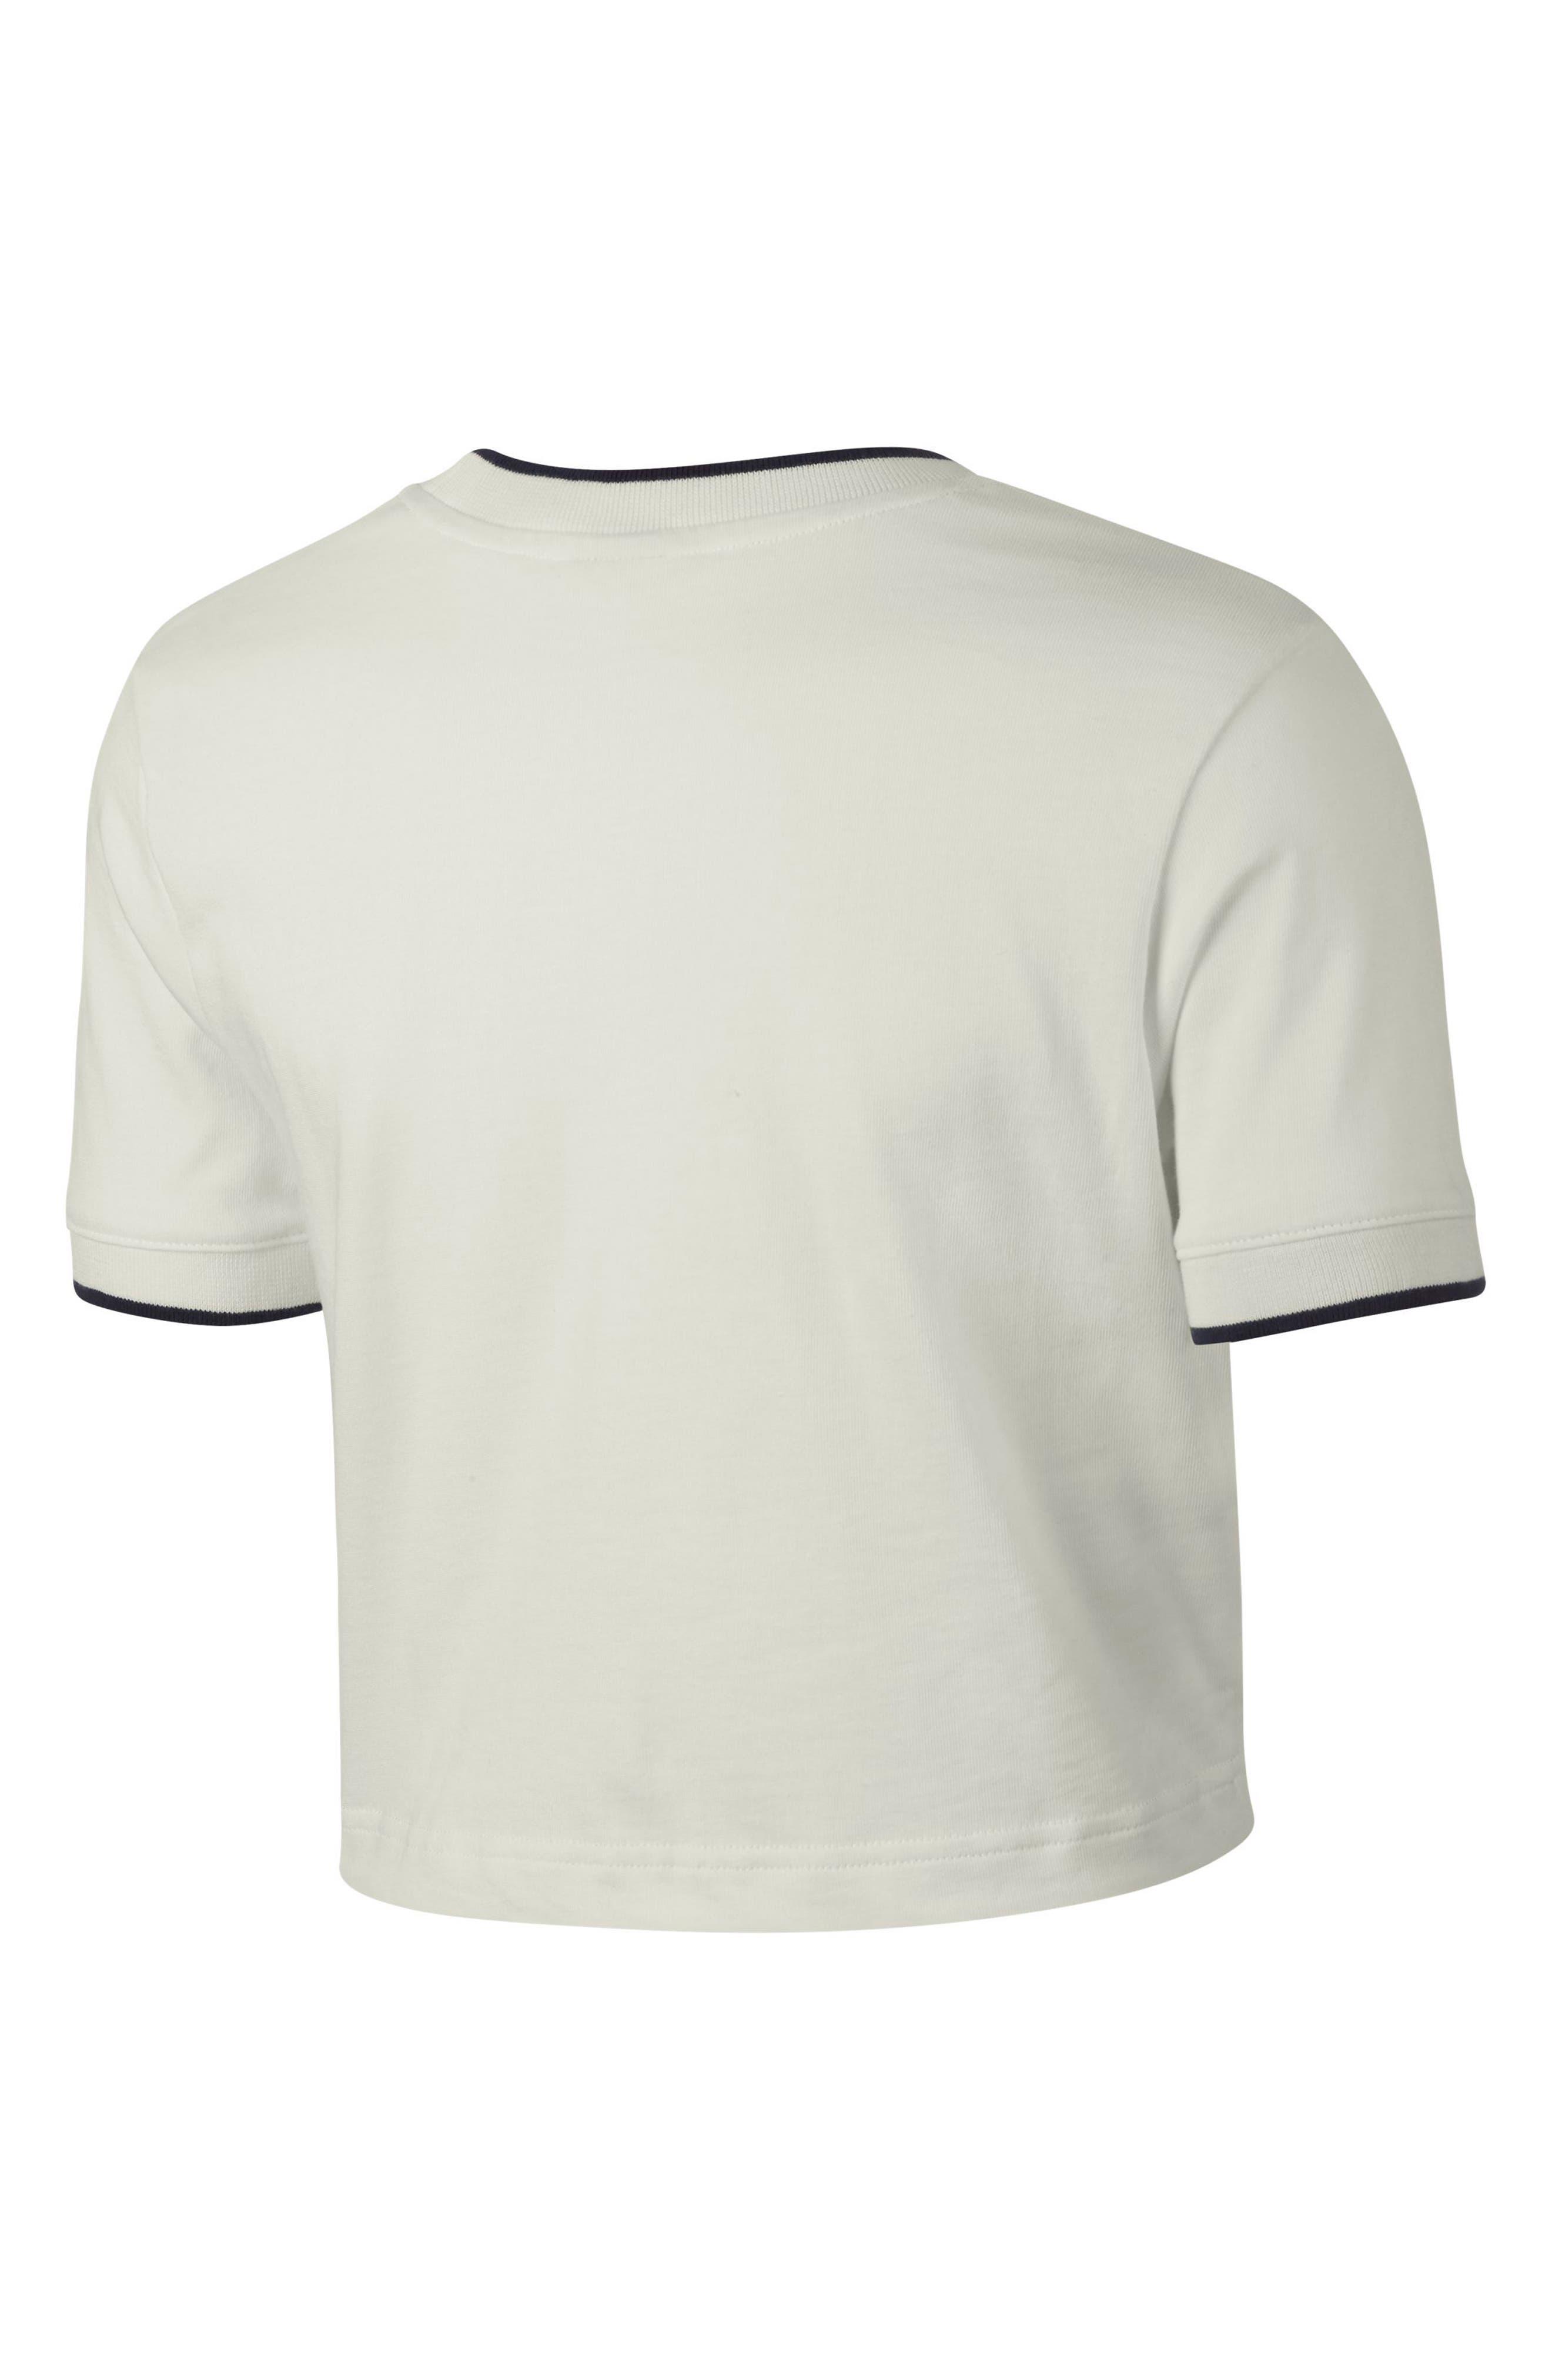 Sportswear Crop Top,                             Alternate thumbnail 7, color,                             Sail